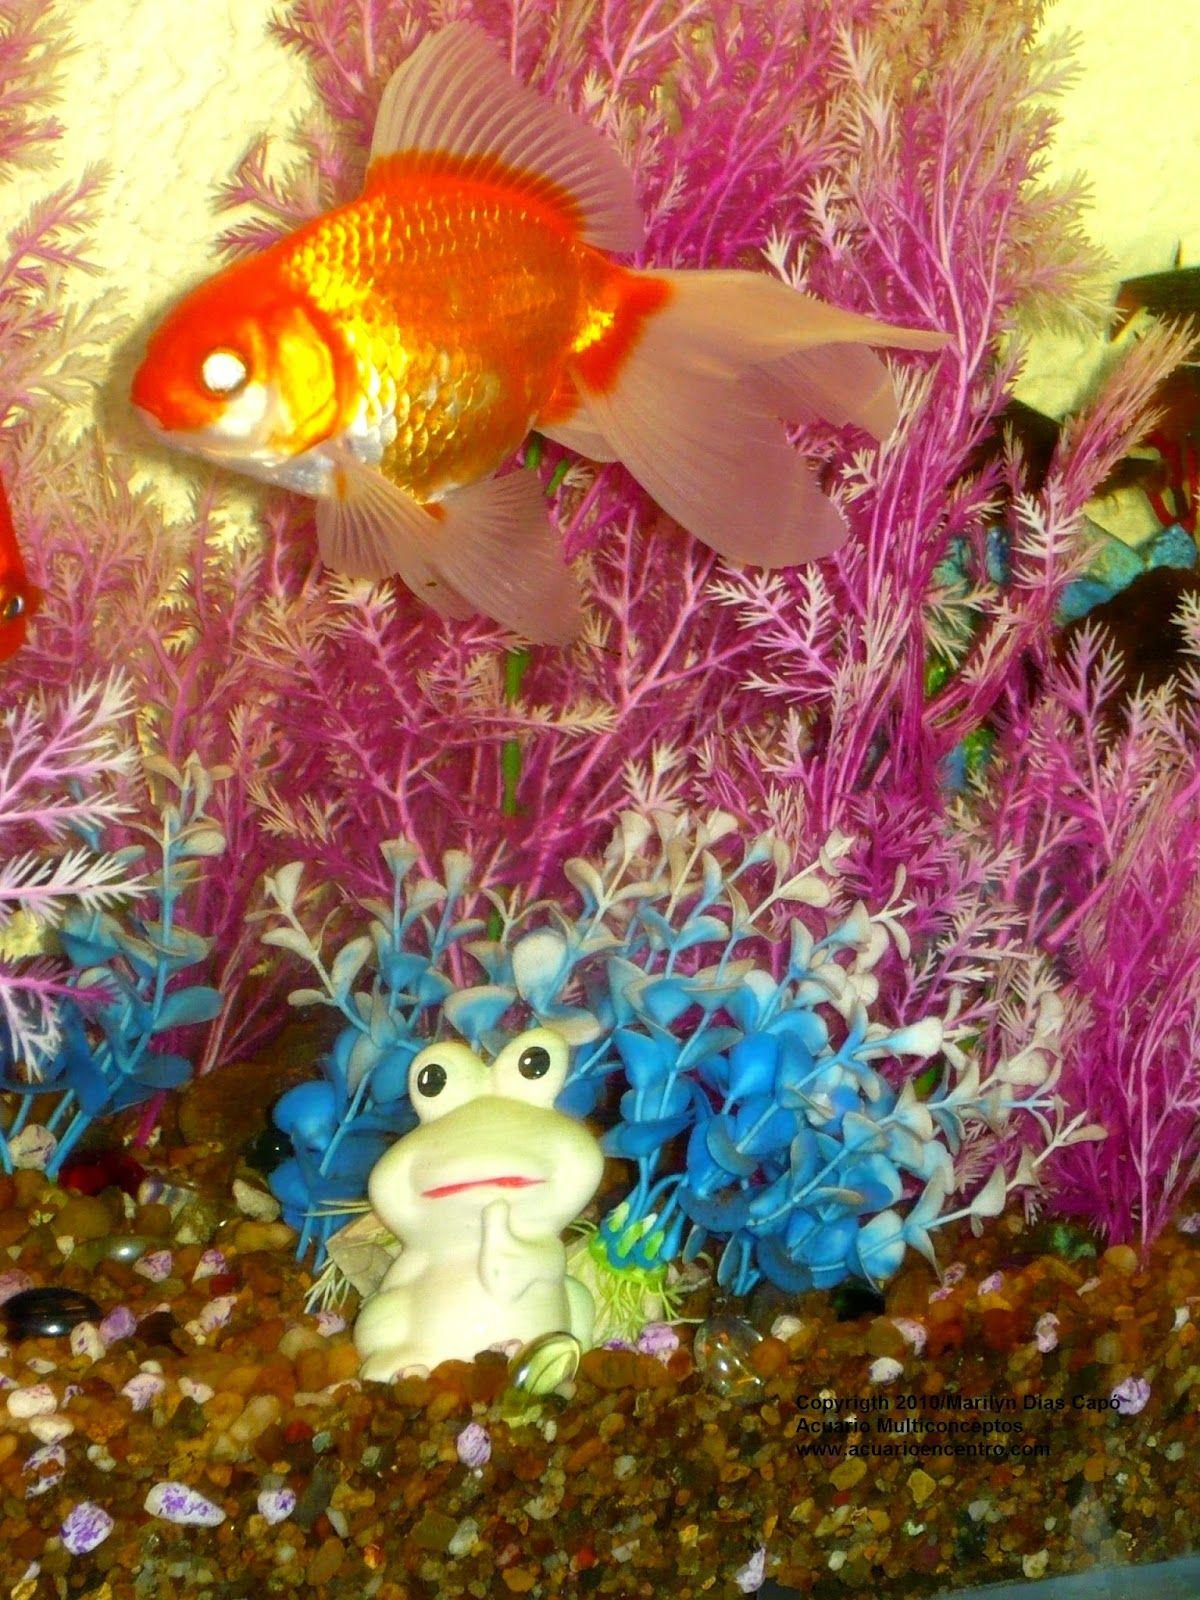 Peces tropicales de agua dulce. | acuario | Pinterest | Fishbowl and ...